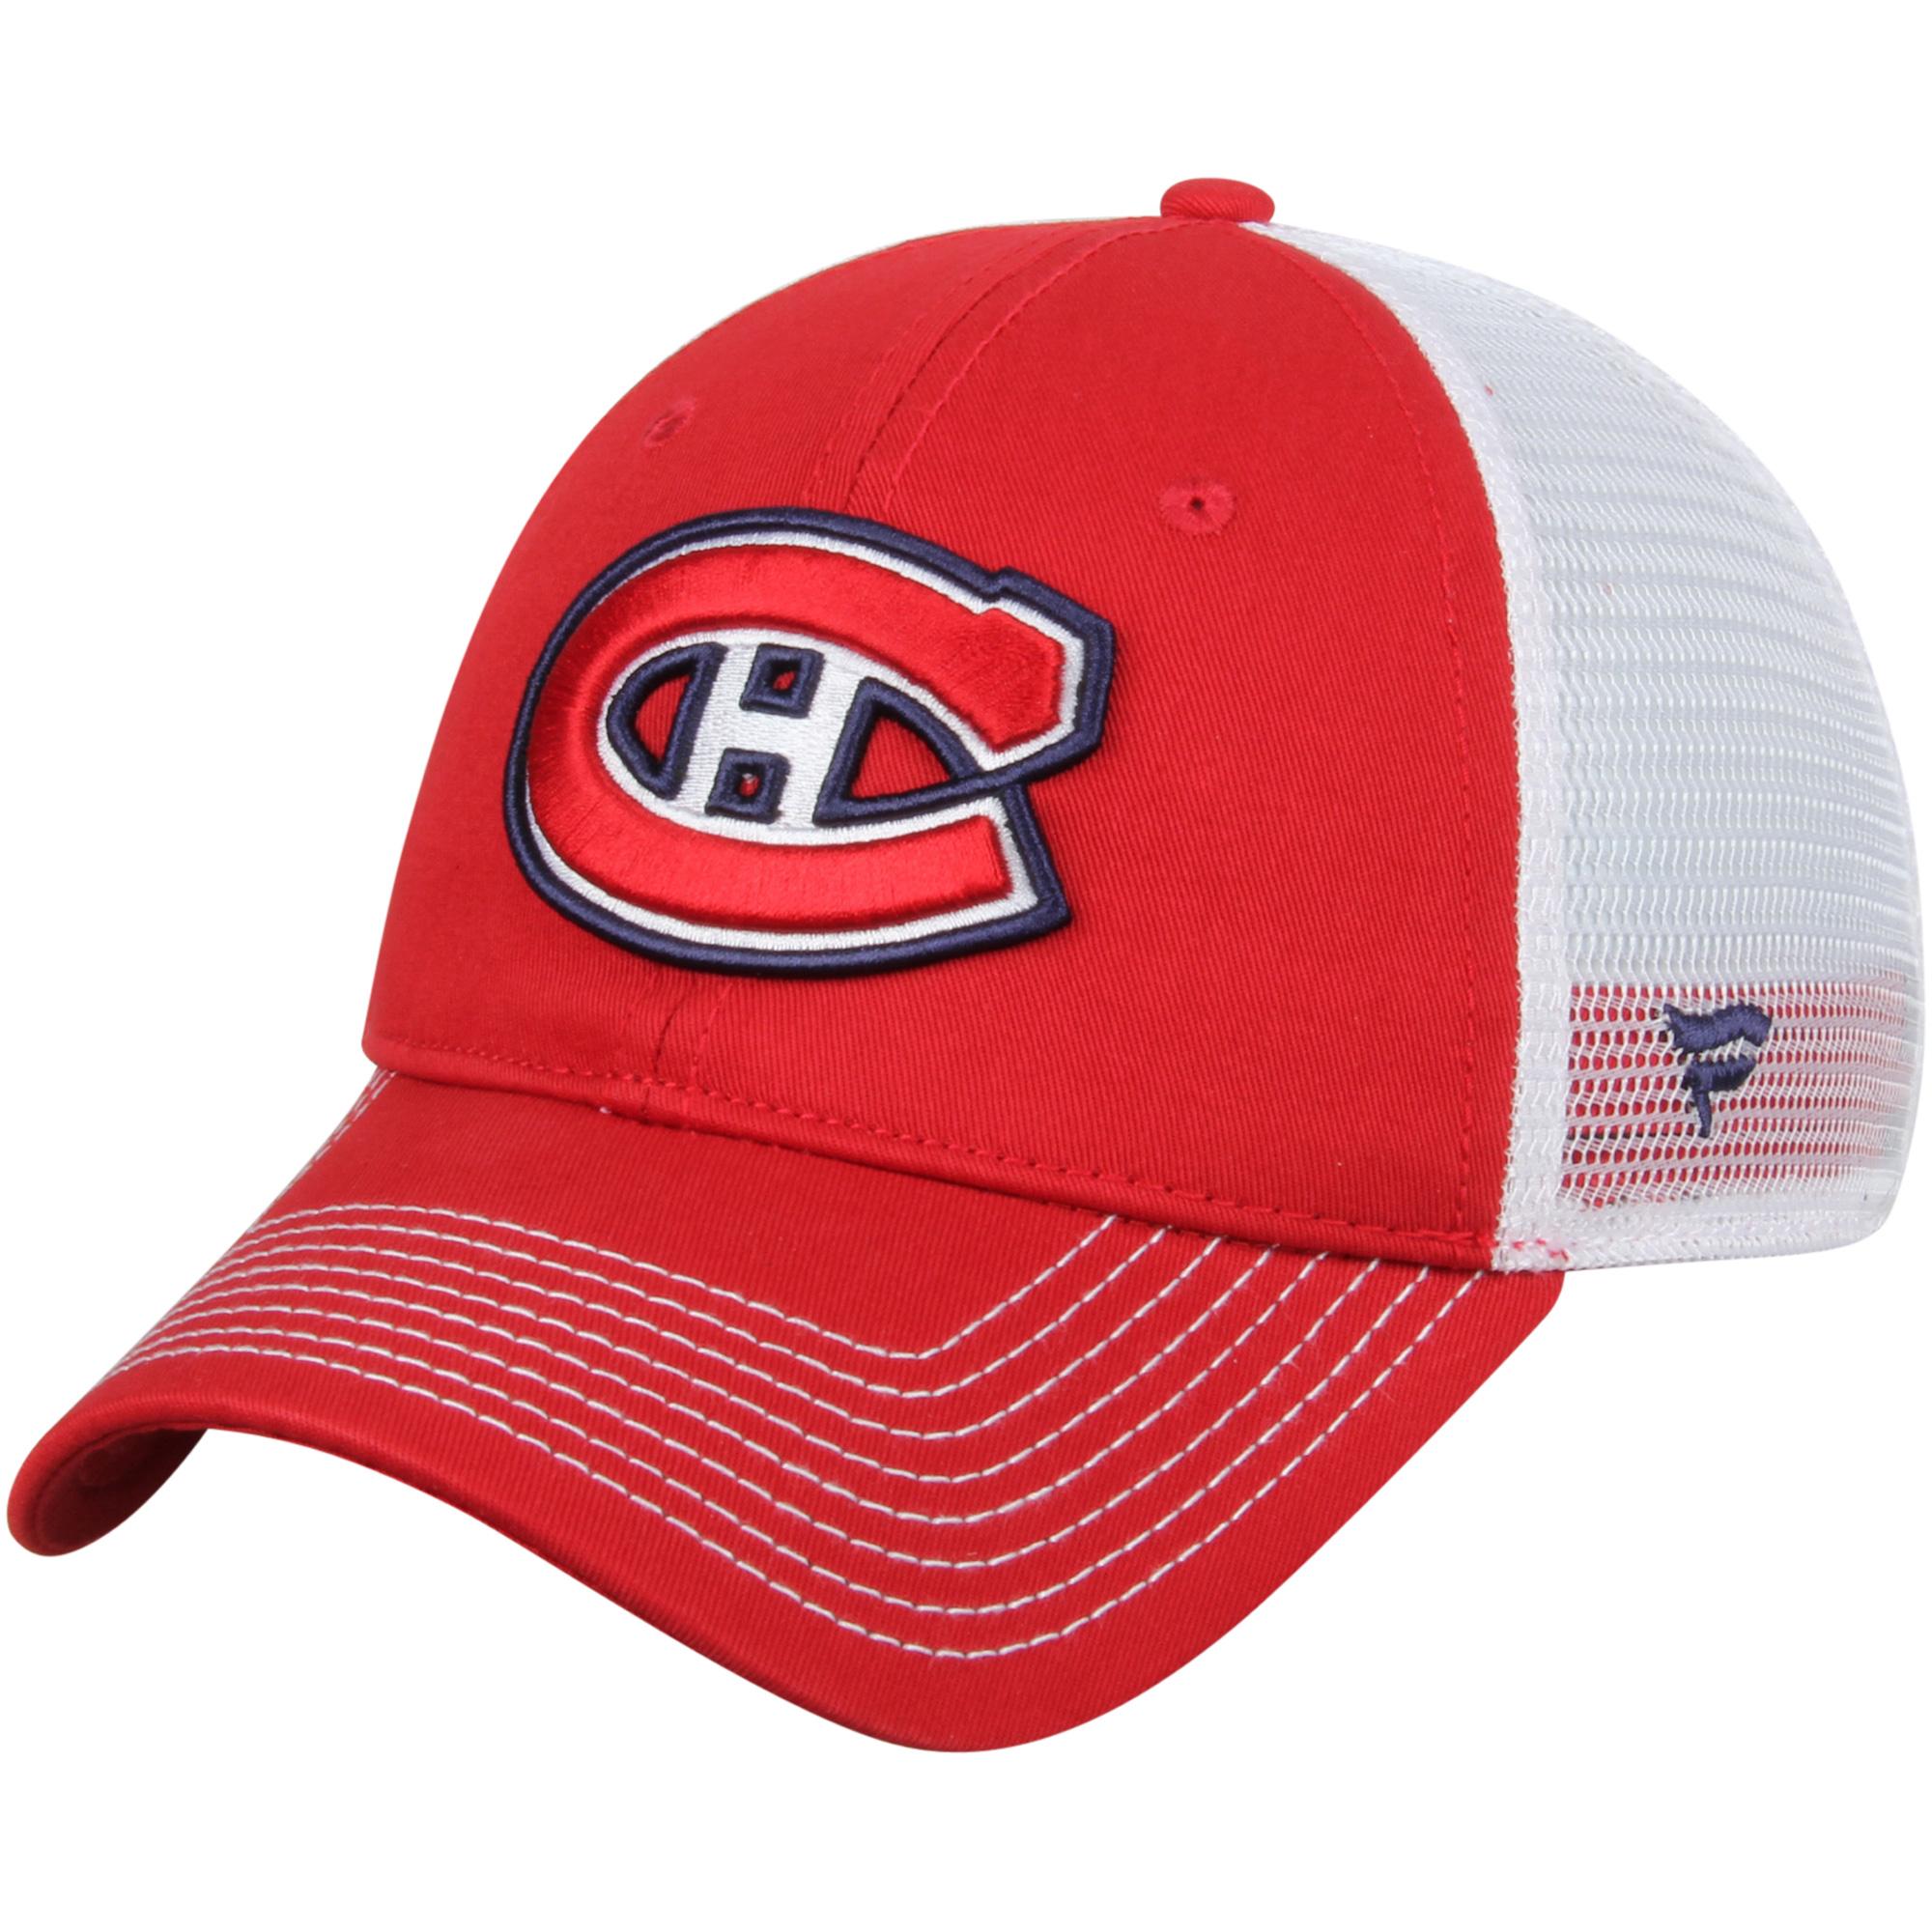 Montreal Canadiens Core Trucker Adjustable Snapback Hat - Red - OSFA